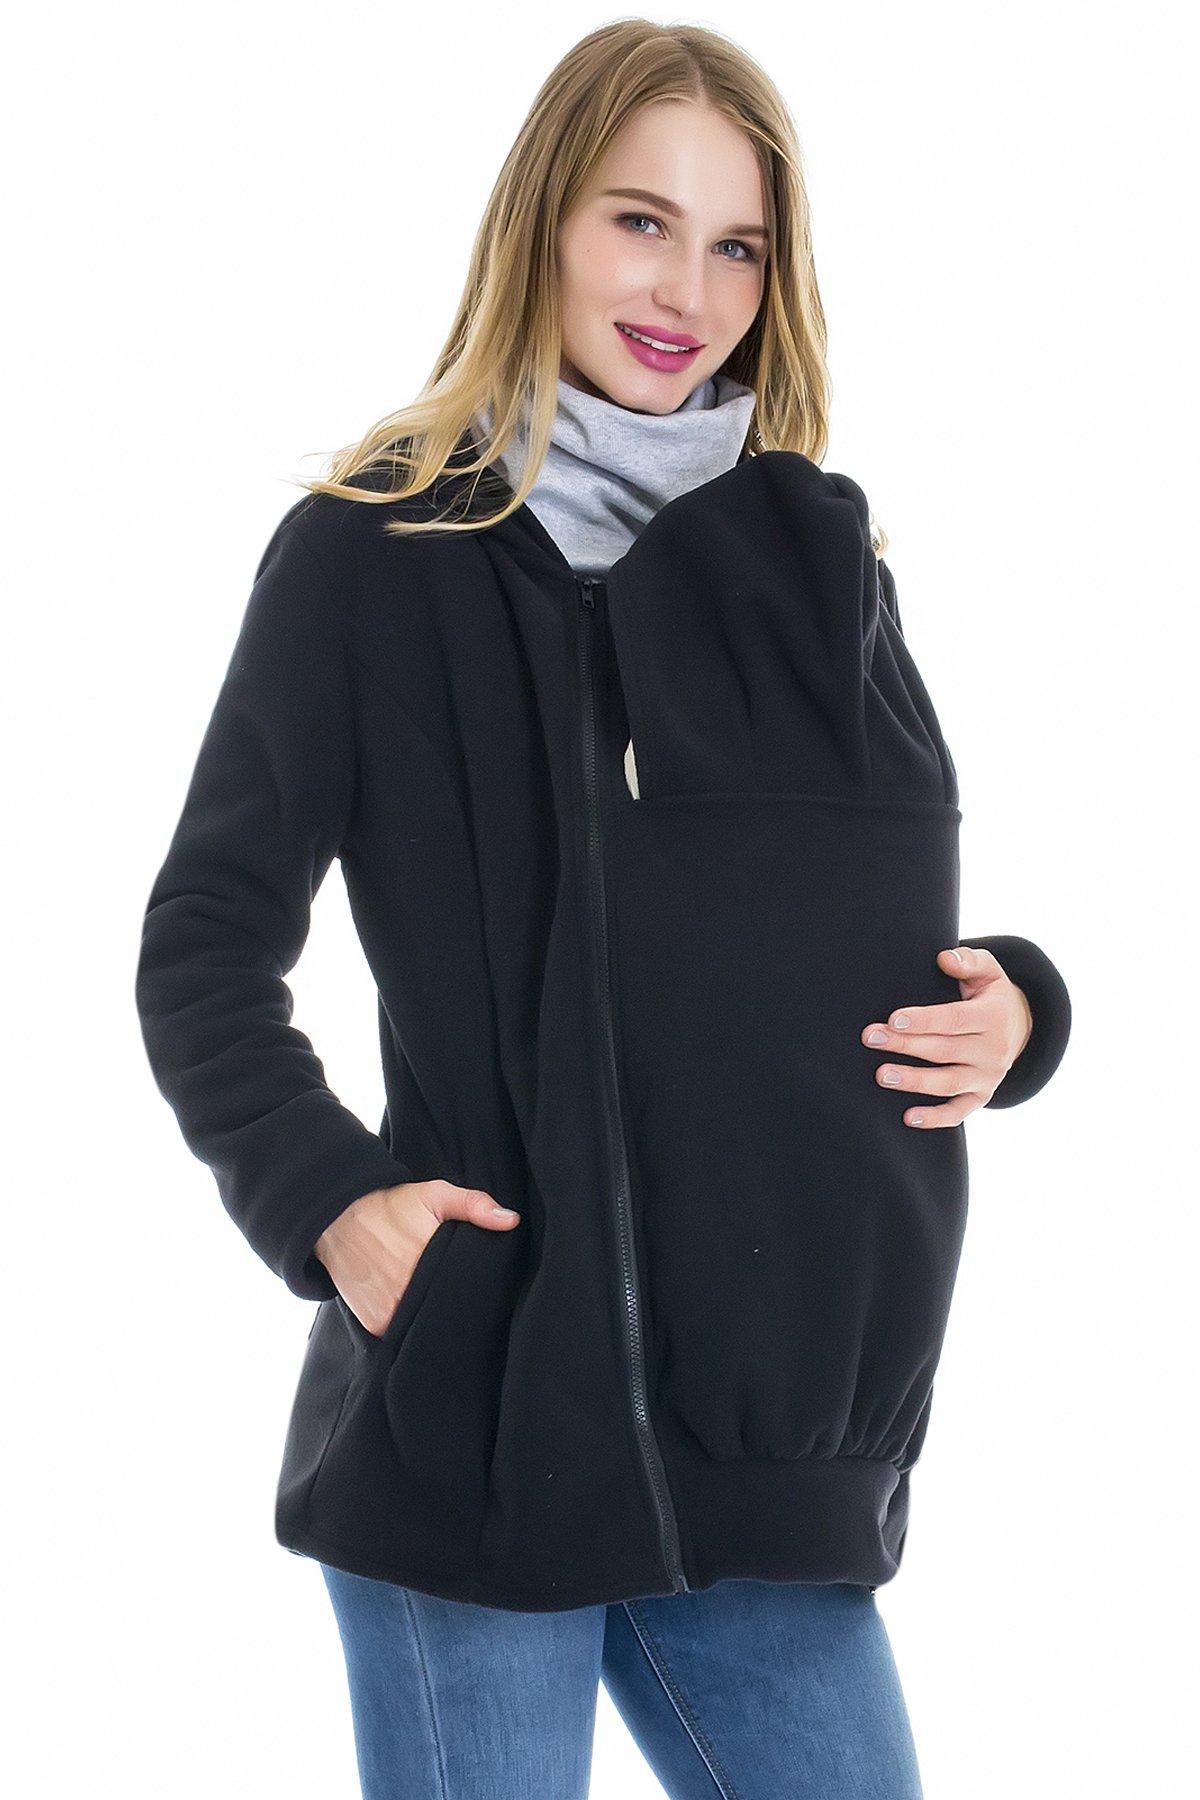 Smallshow Womens Fleece Maternity Baby Carrier Sweatshirt Jacket Large Black by Smallshow